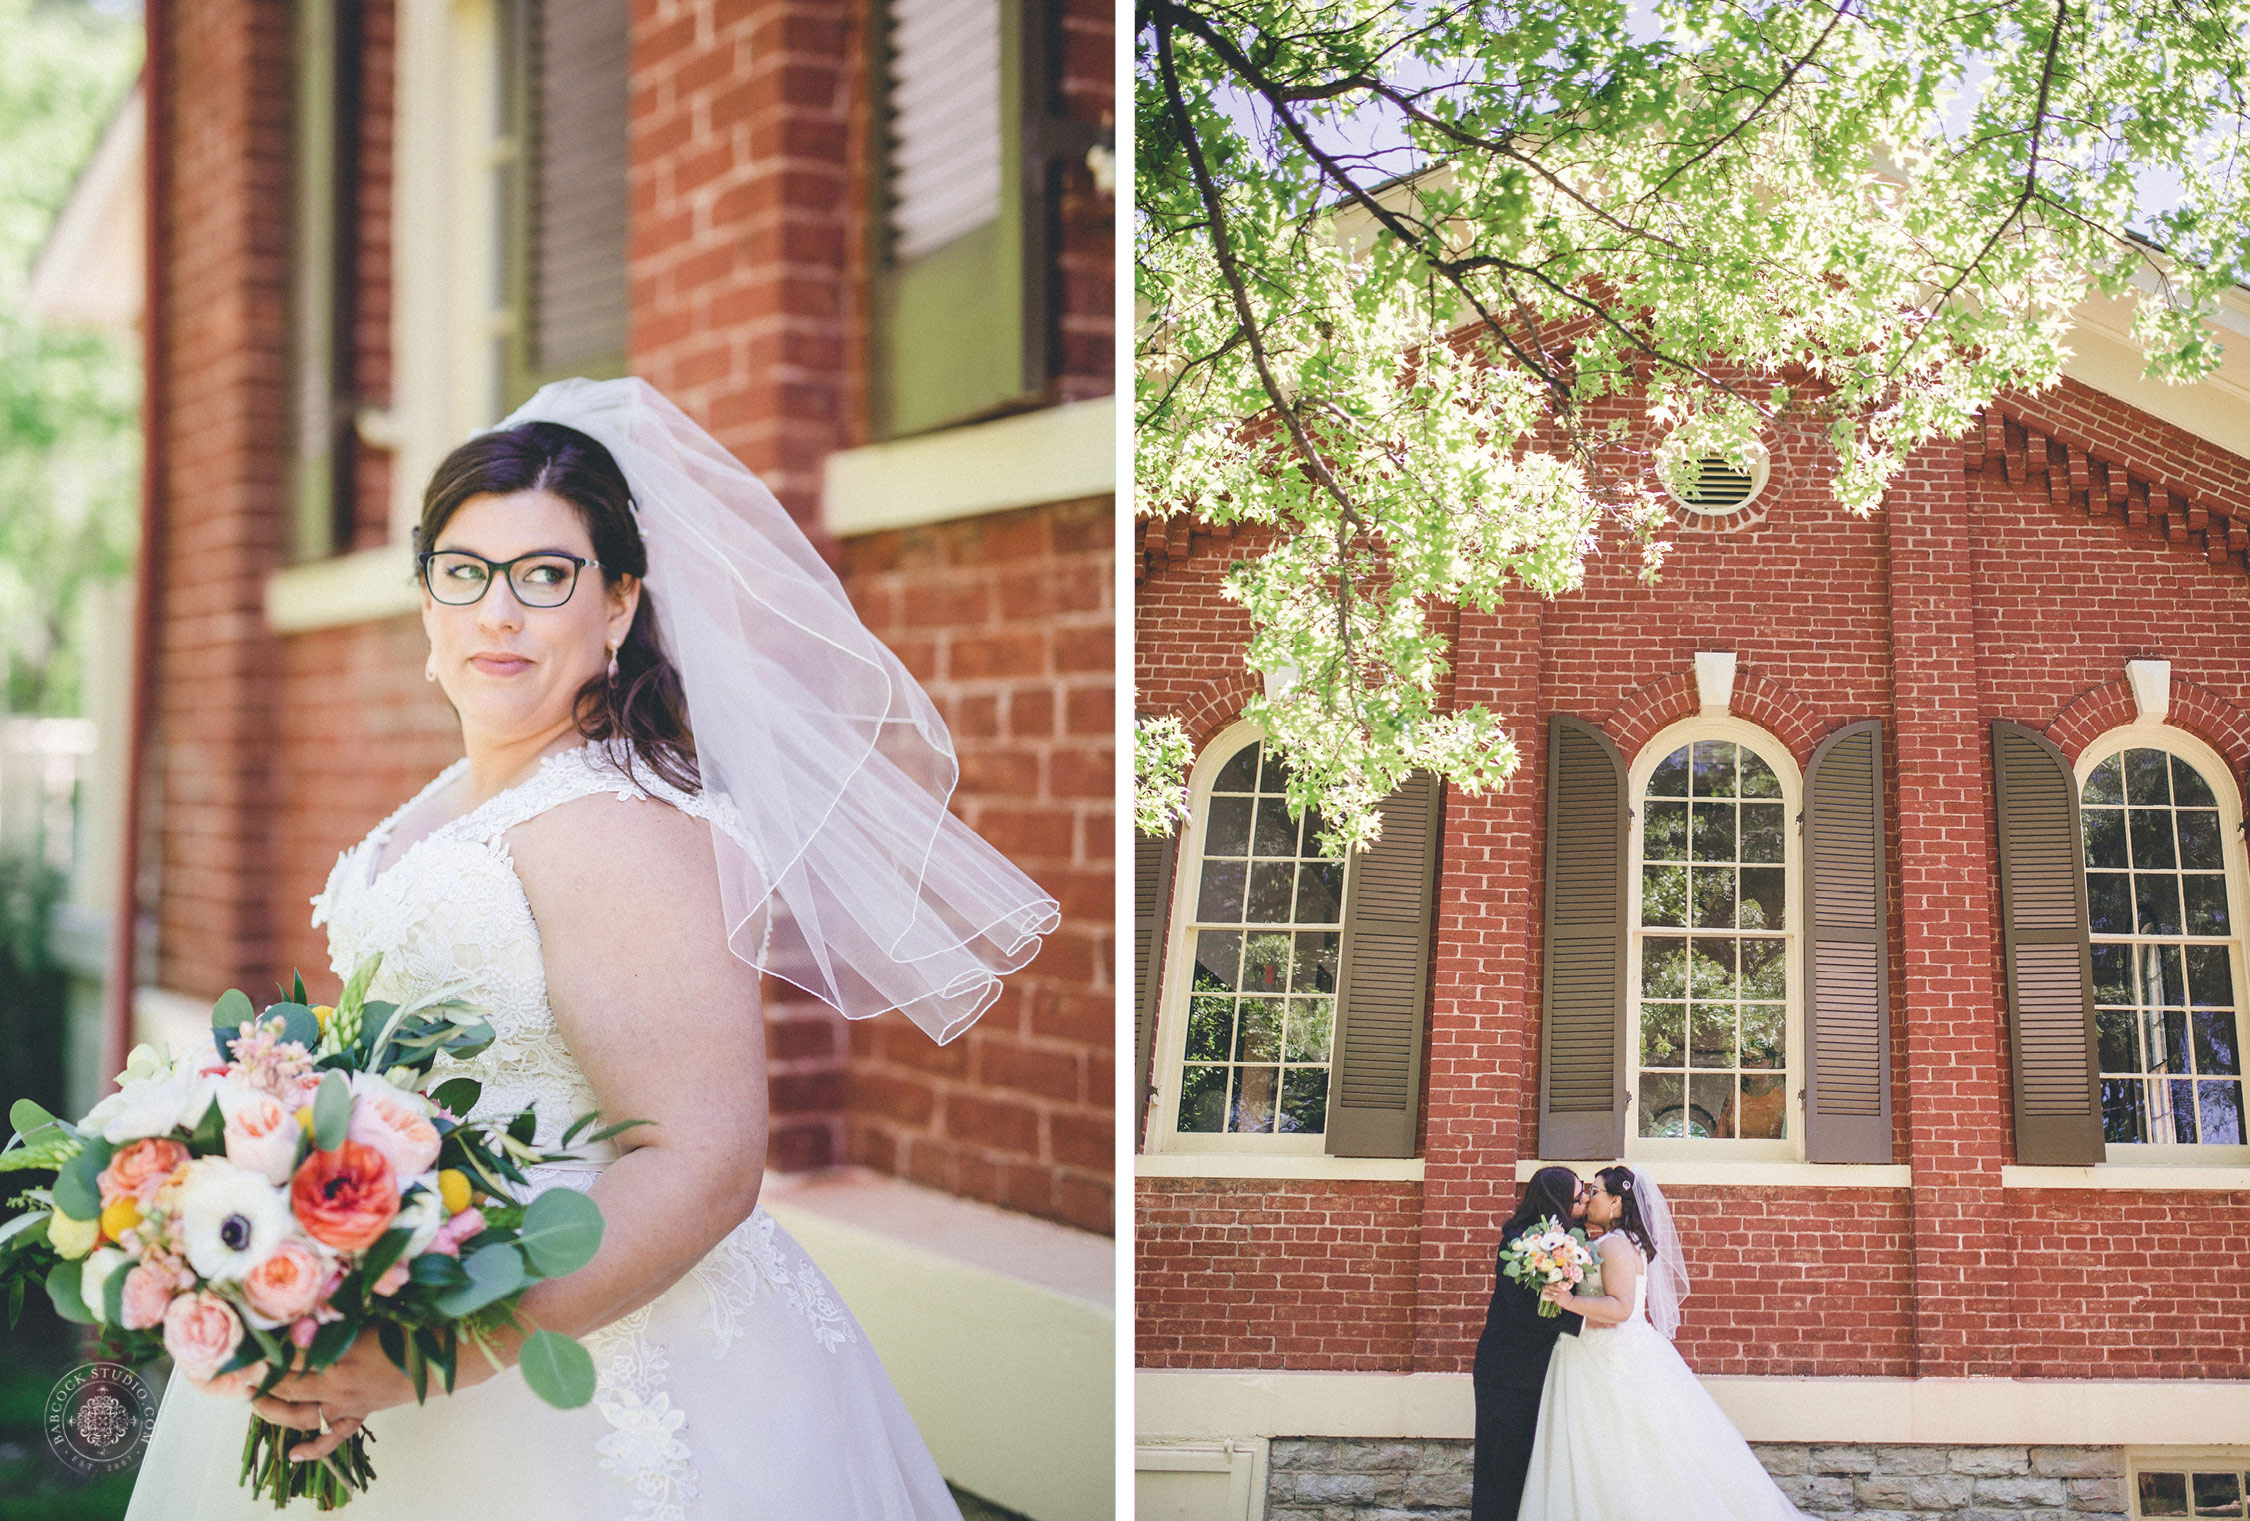 nicole-brendarn-school-house-wedding-photographer-dayton-ohio-6.jpg